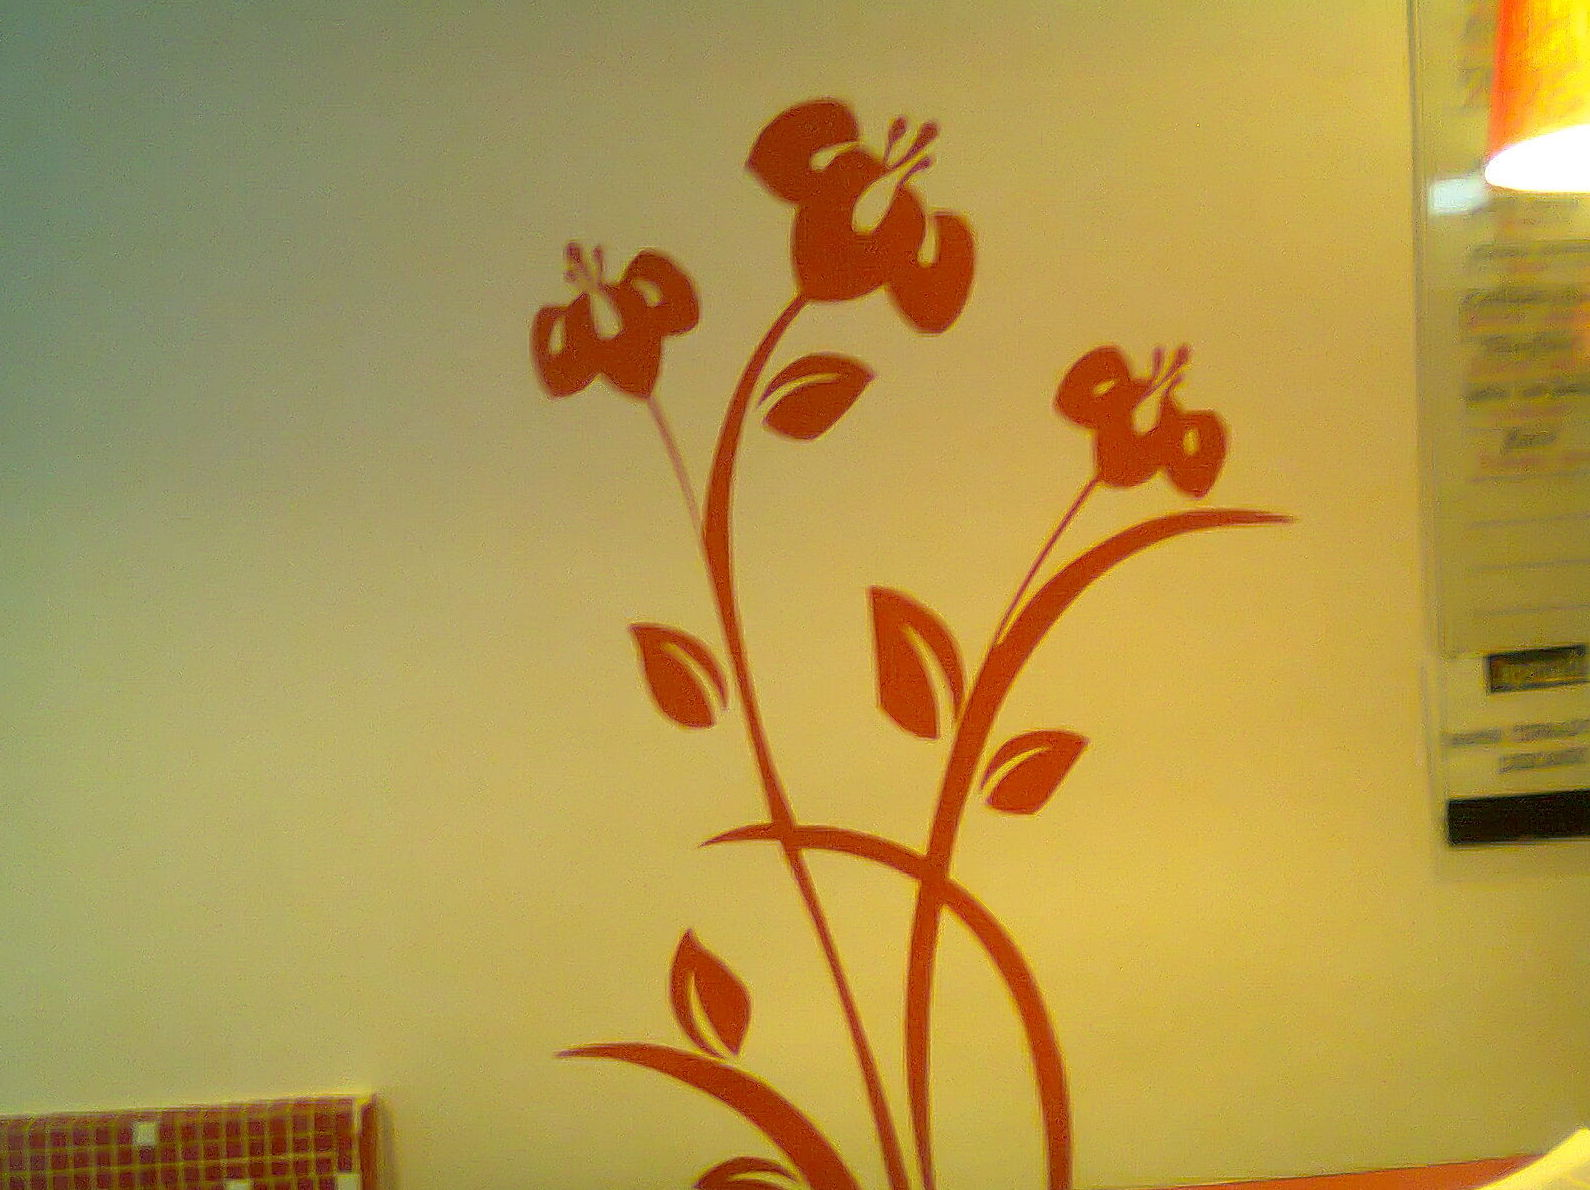 Vinilos decorativos